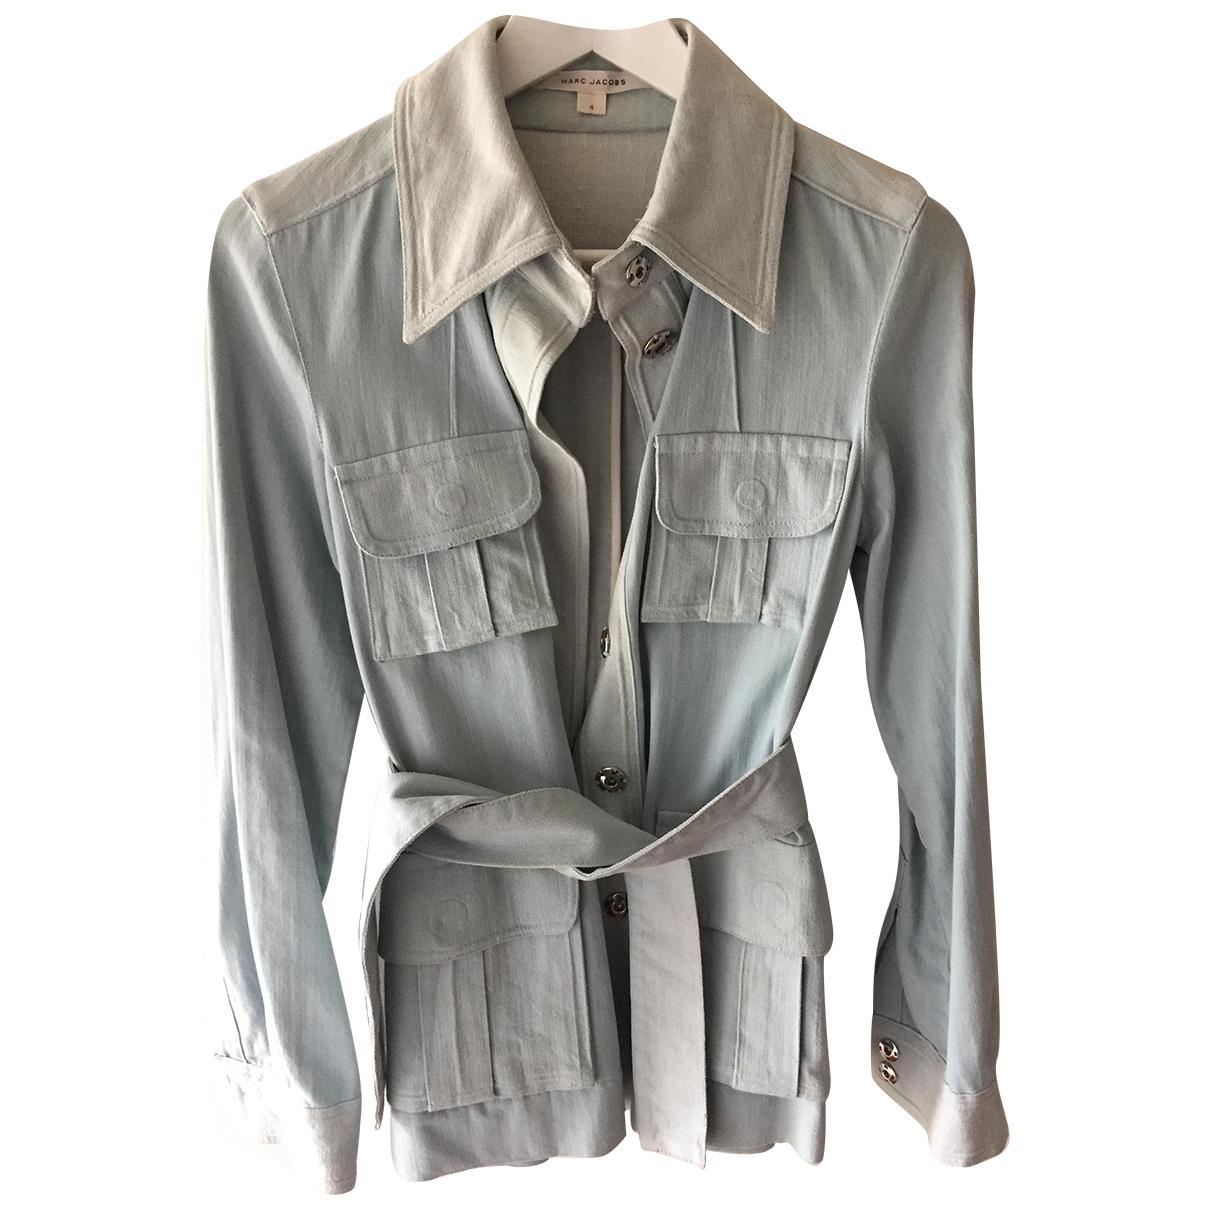 Marc Jacobs \N Blue Denim - Jeans jacket for Women 4 US